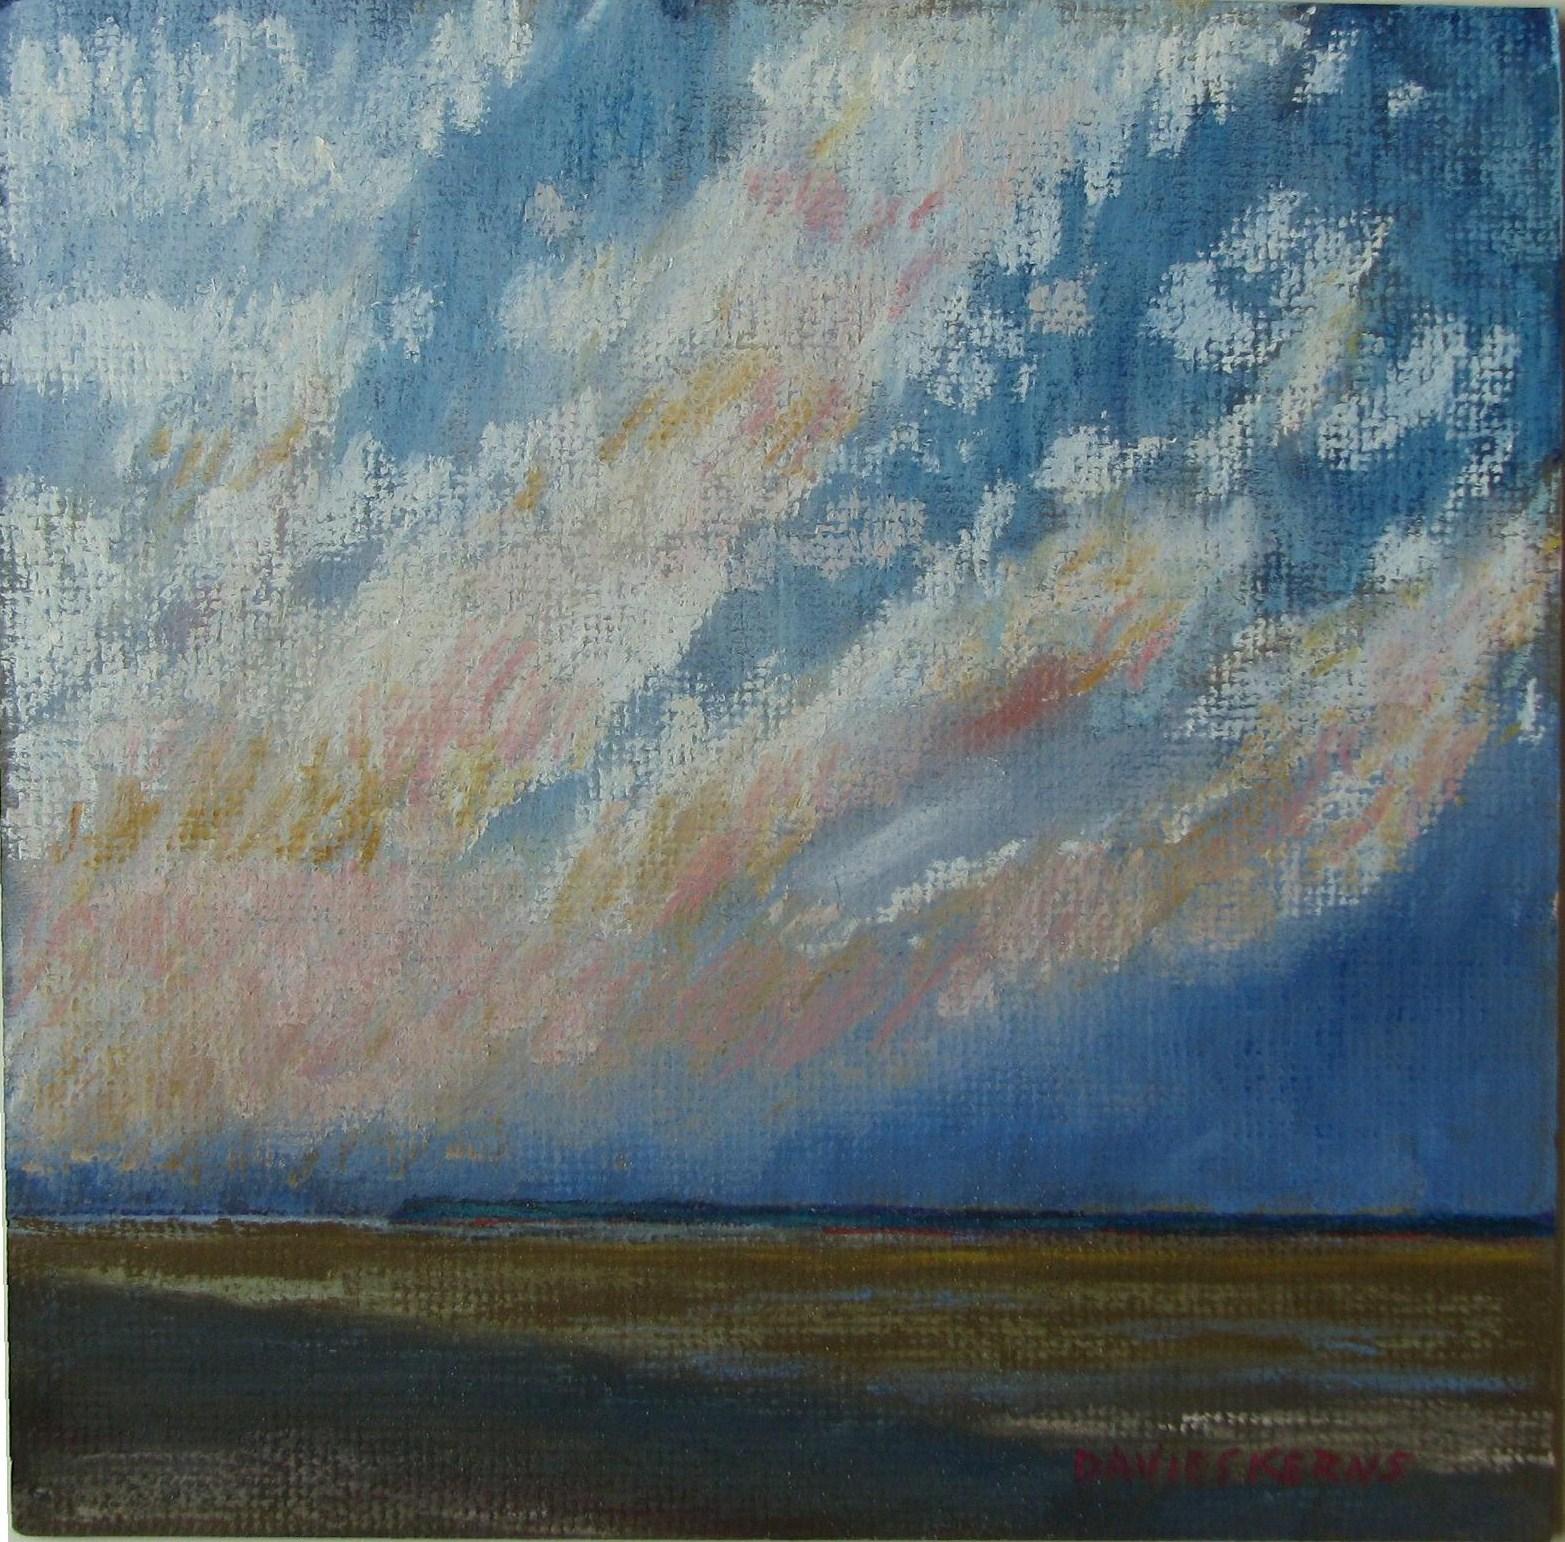 """december sky 2"" original fine art by Mary Davies Kerns"